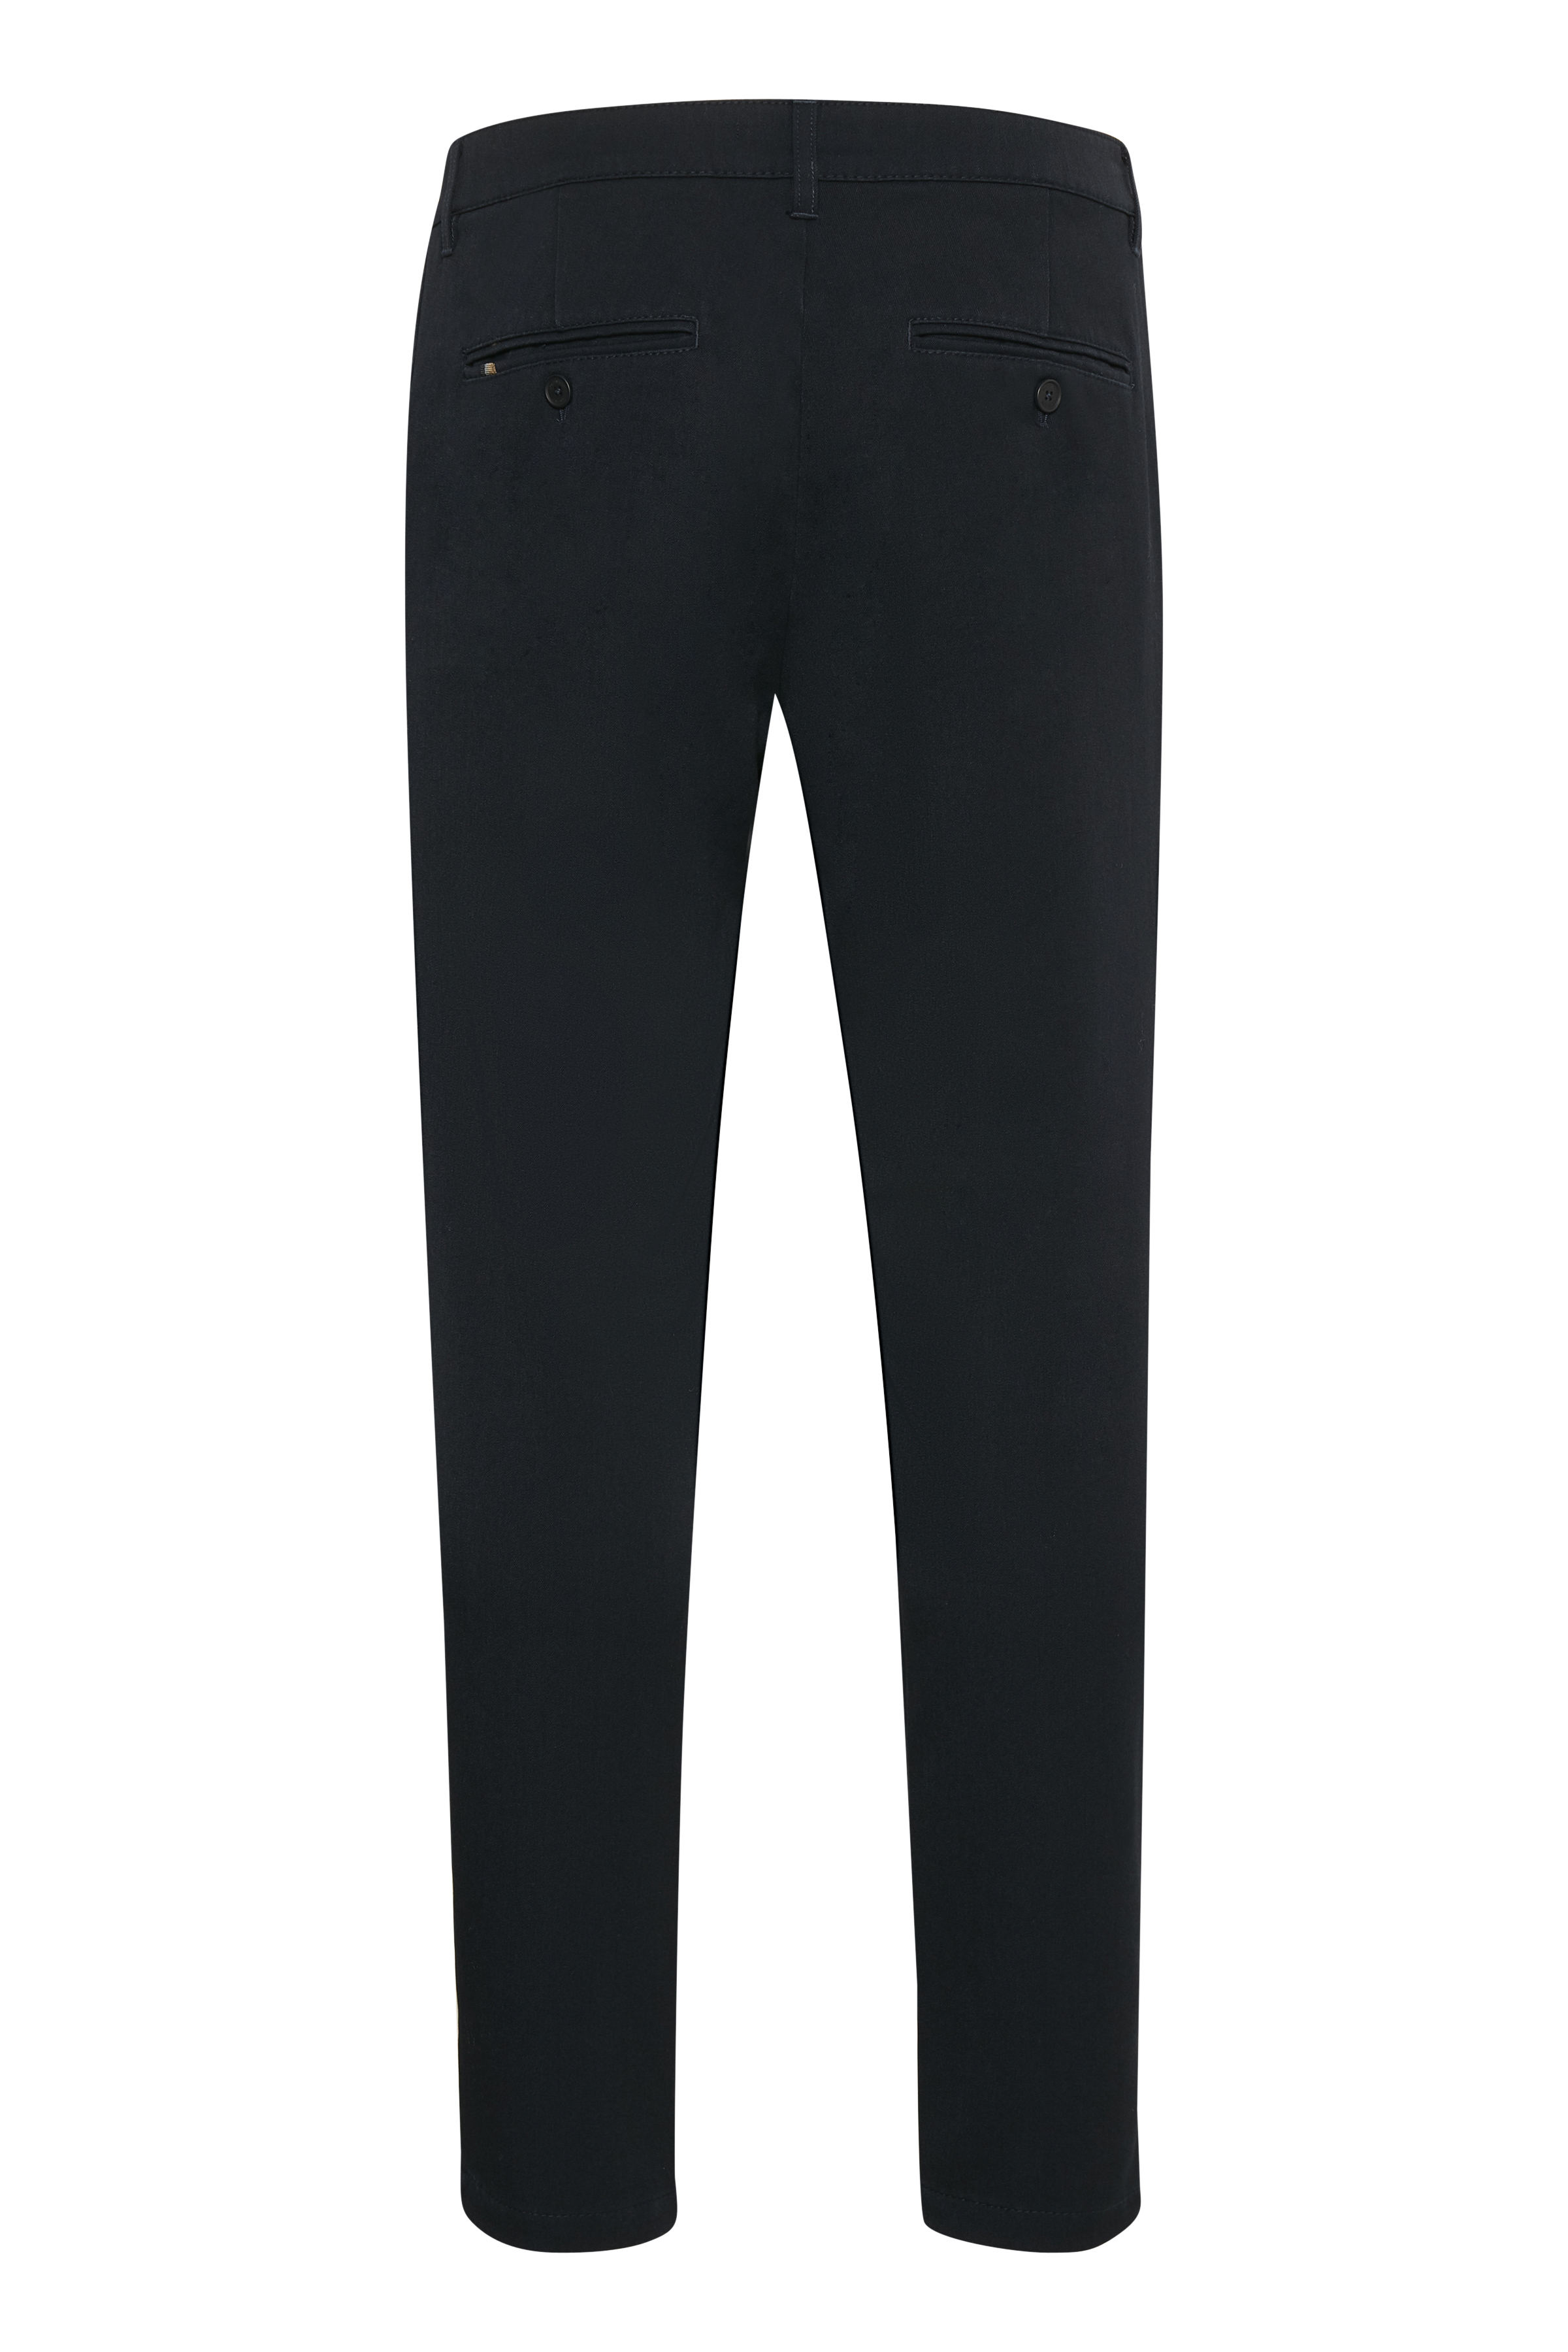 Dark Navy Paton Jersey Bukser – Køb Dark Navy Paton Jersey Bukser fra str. L-XXL her